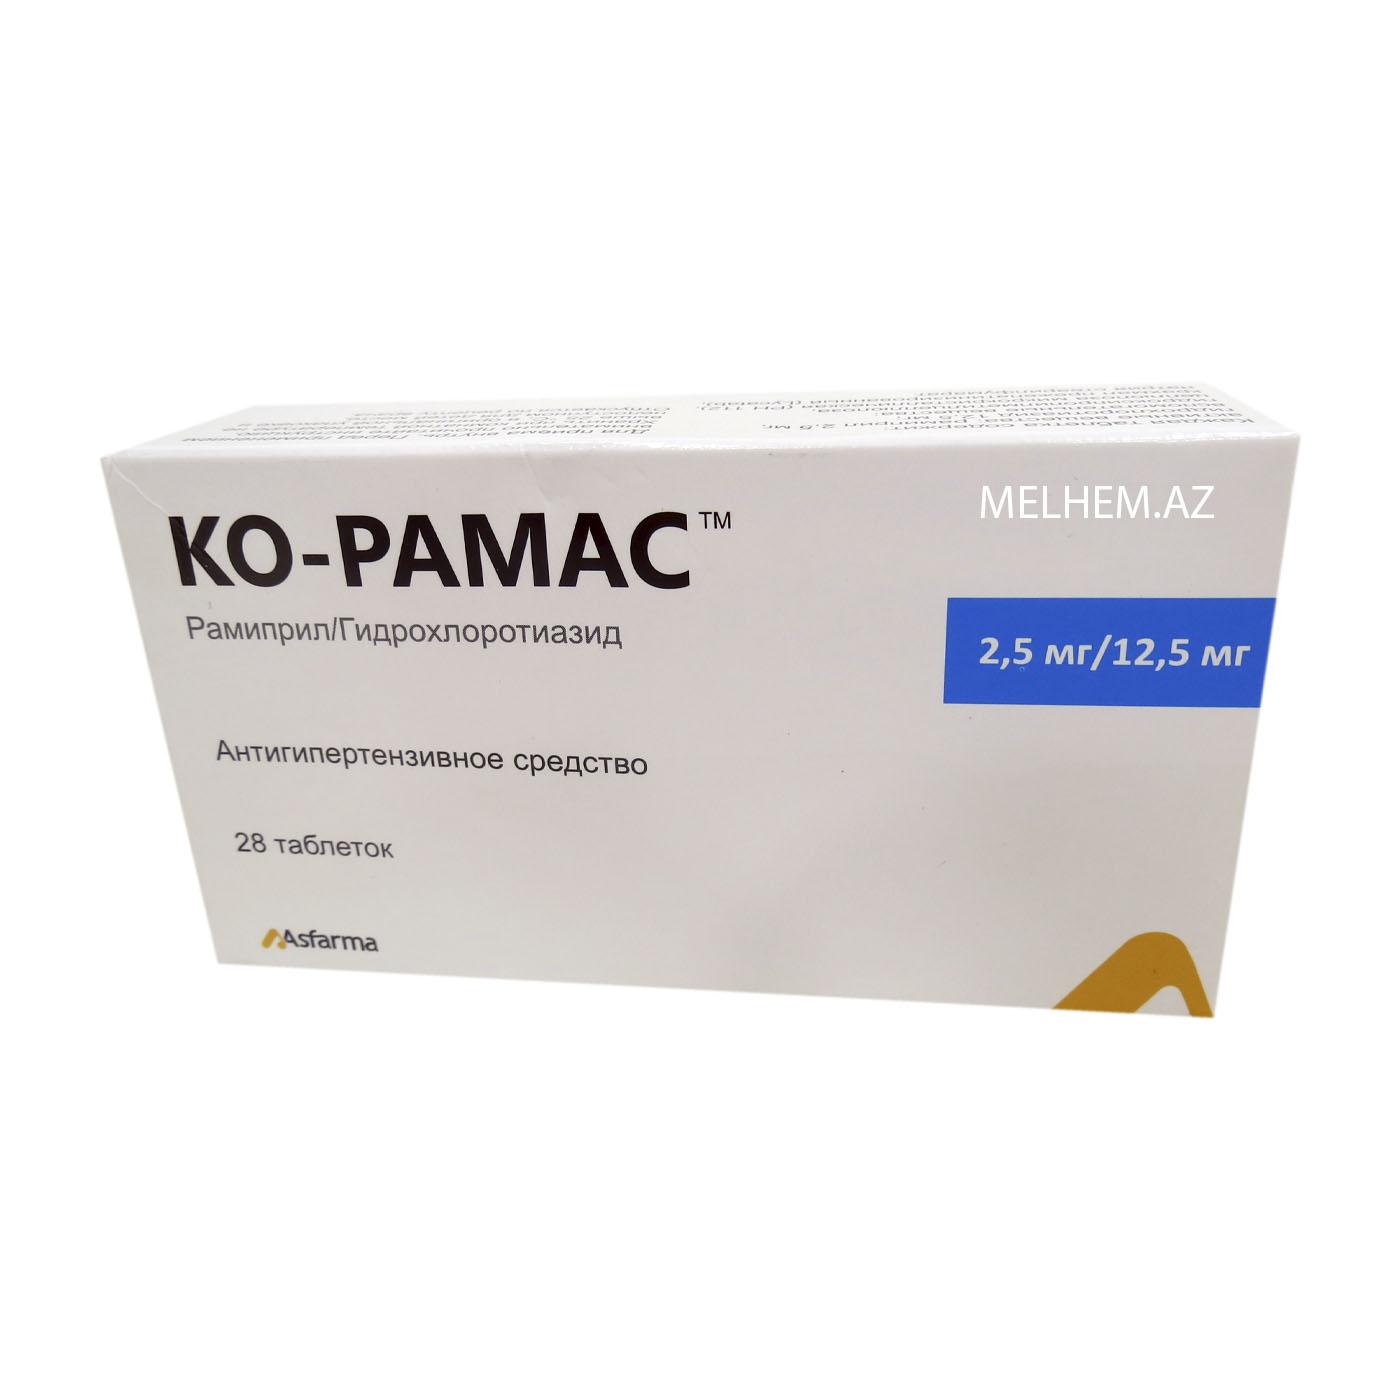 KO-RAMAS 2.5 MQ/12.5 MQ N28 (TABLET)